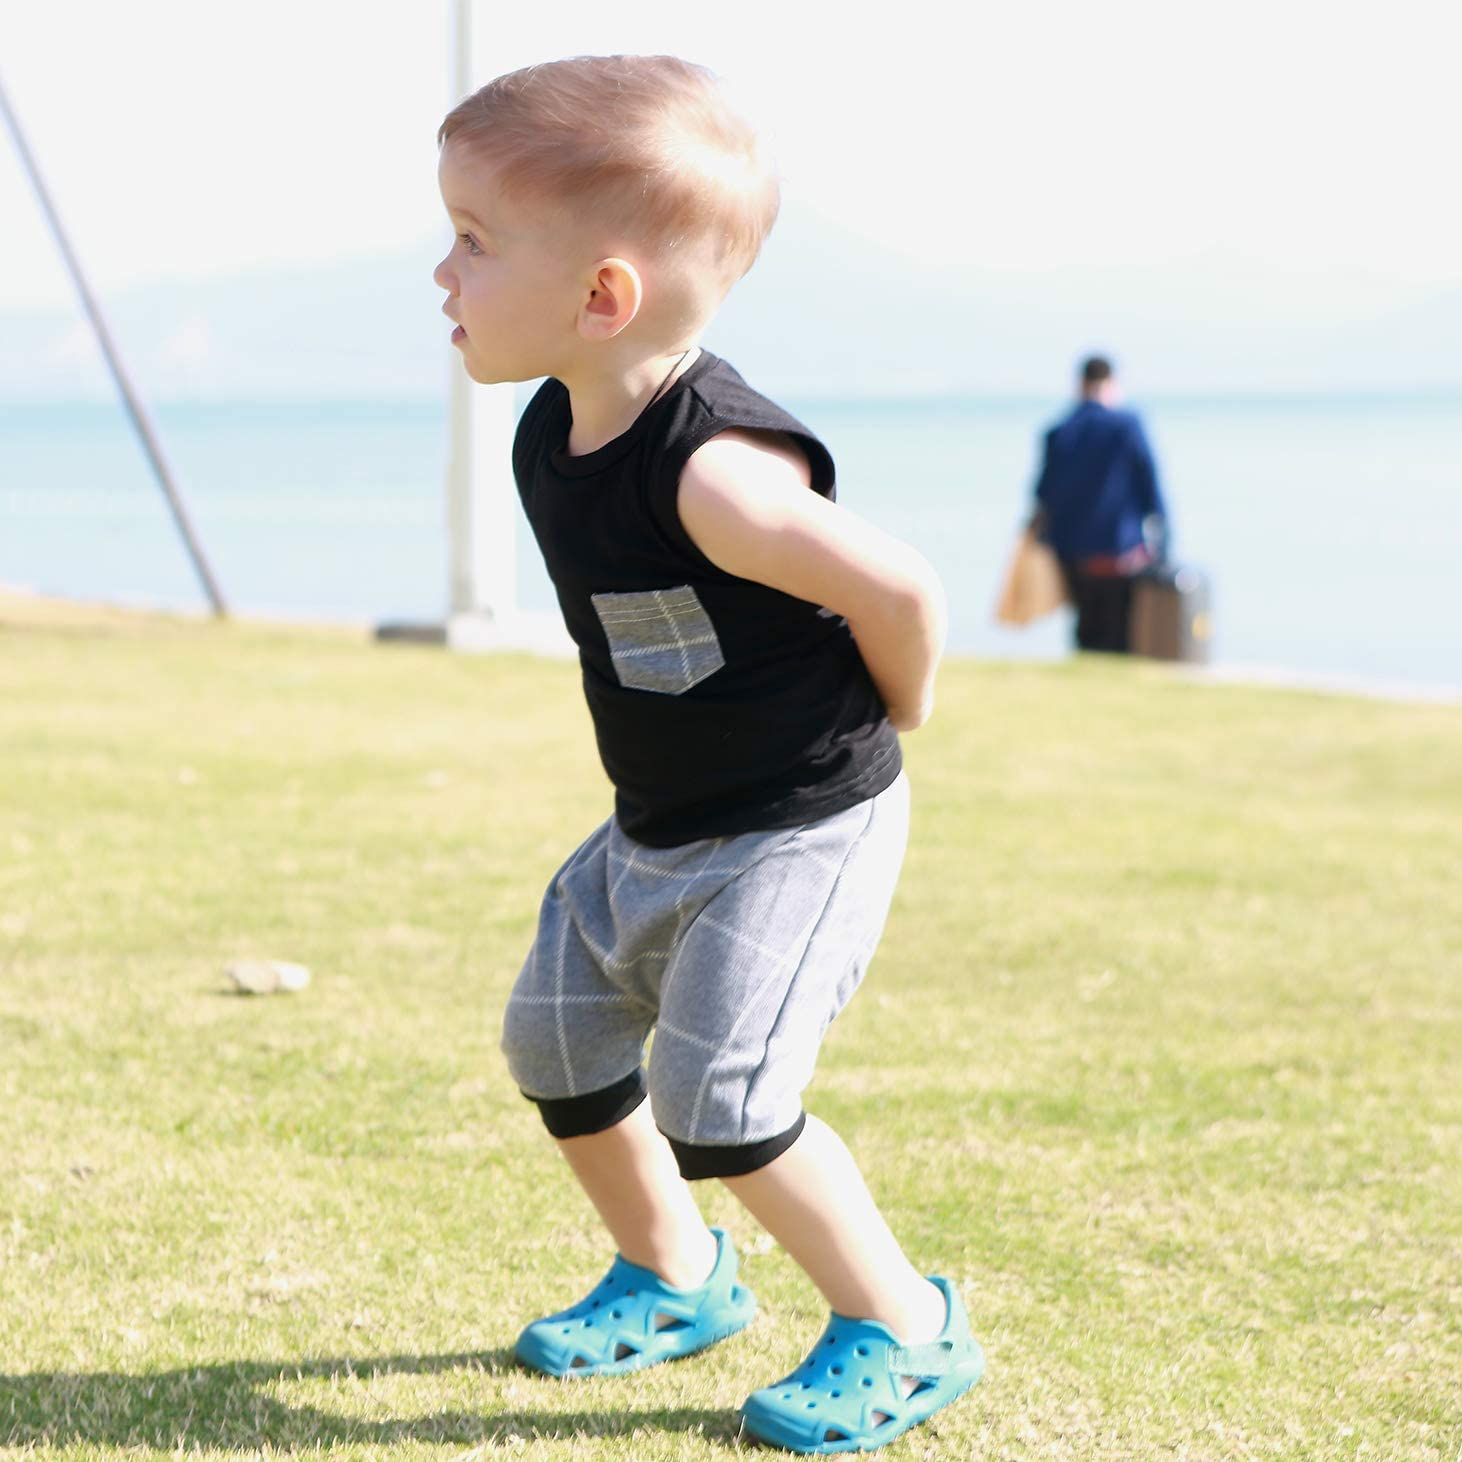 6-12 Months, Camouflage 4 Toddler Baby Boys Short Pants Summer Shorts Infant Bottom with Big Pocket